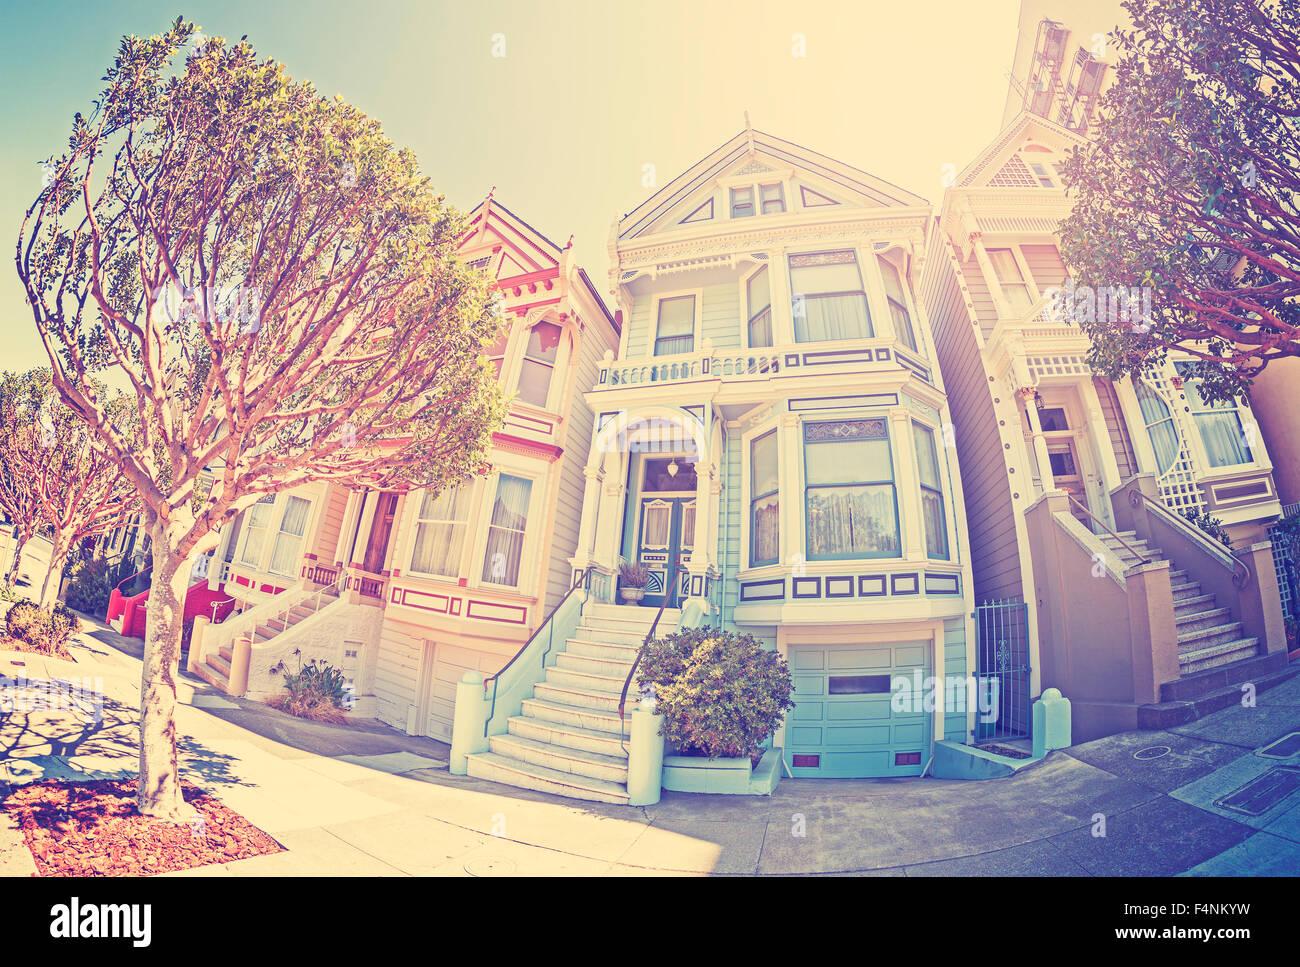 Objectif fisheye stylisé Vintage street photo du Painted Ladies, San Francisco, USA. Photo Stock